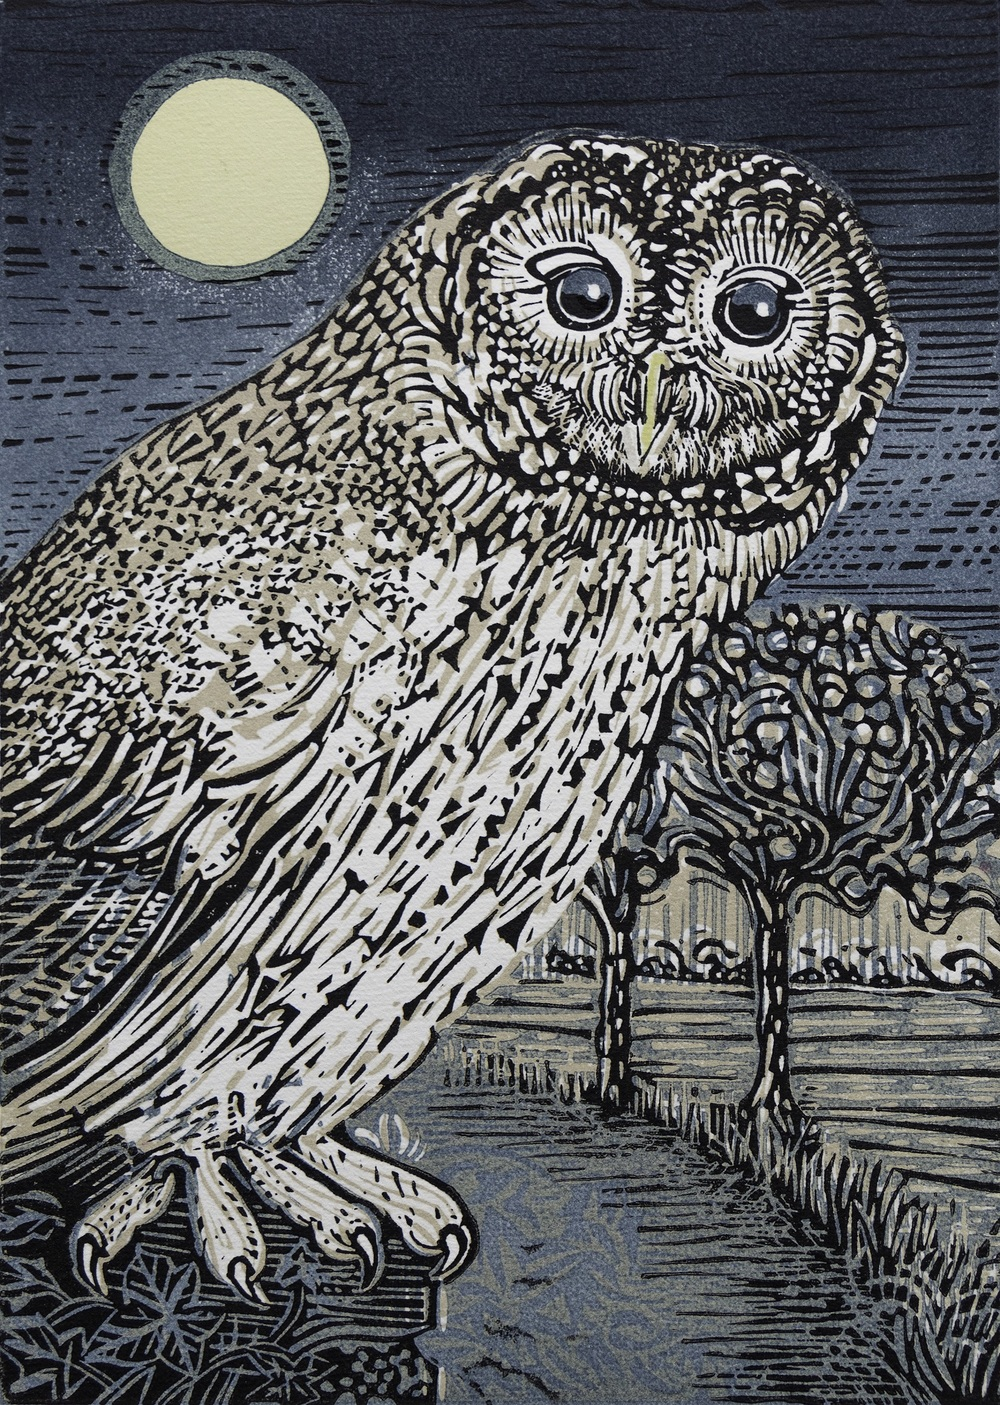 Tawny Owl linocut £120 (unframed)